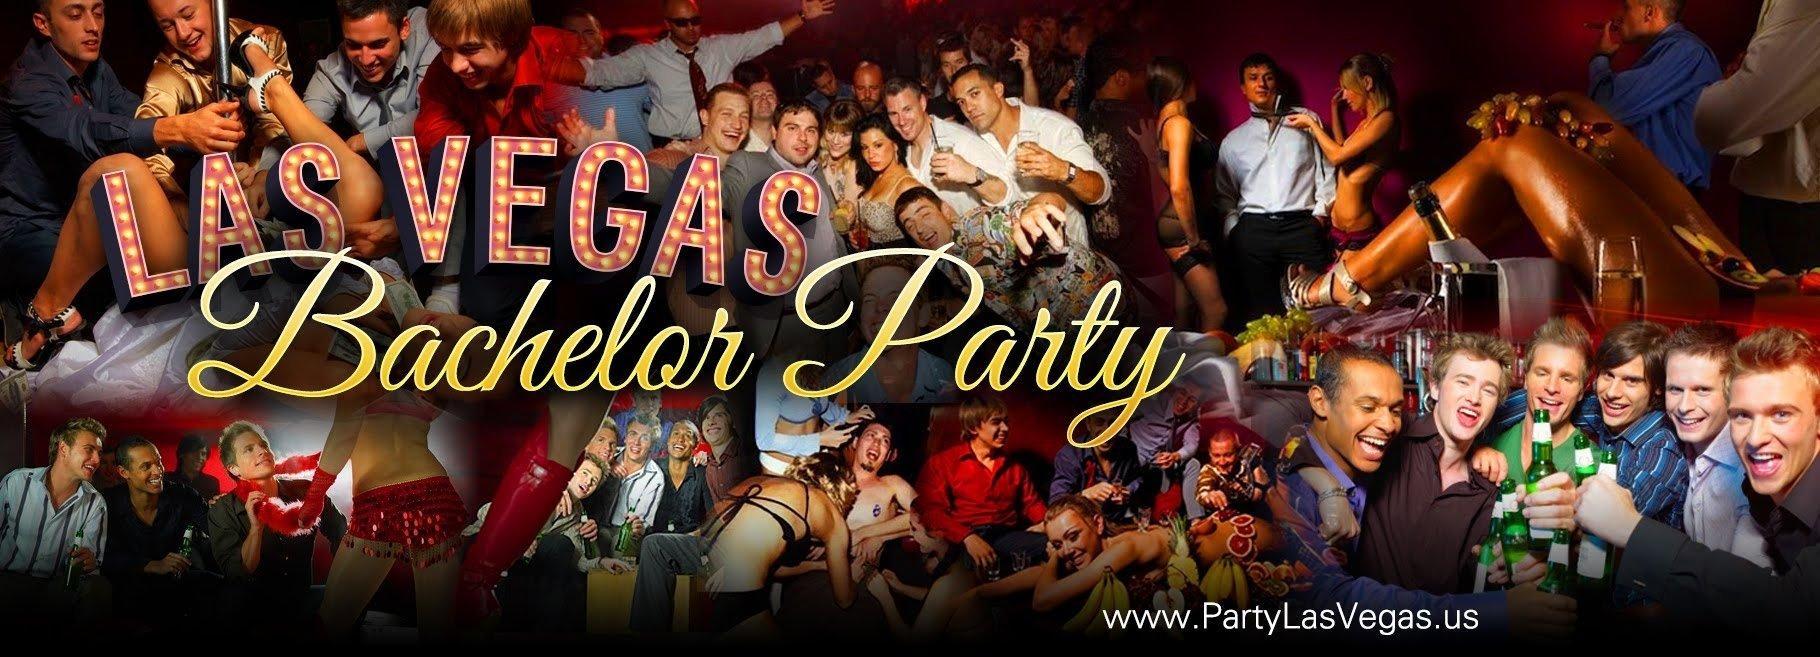 10 Stunning Bachelor Party Ideas Las Vegas is this the best las vegas bachelor party video youtube 2020